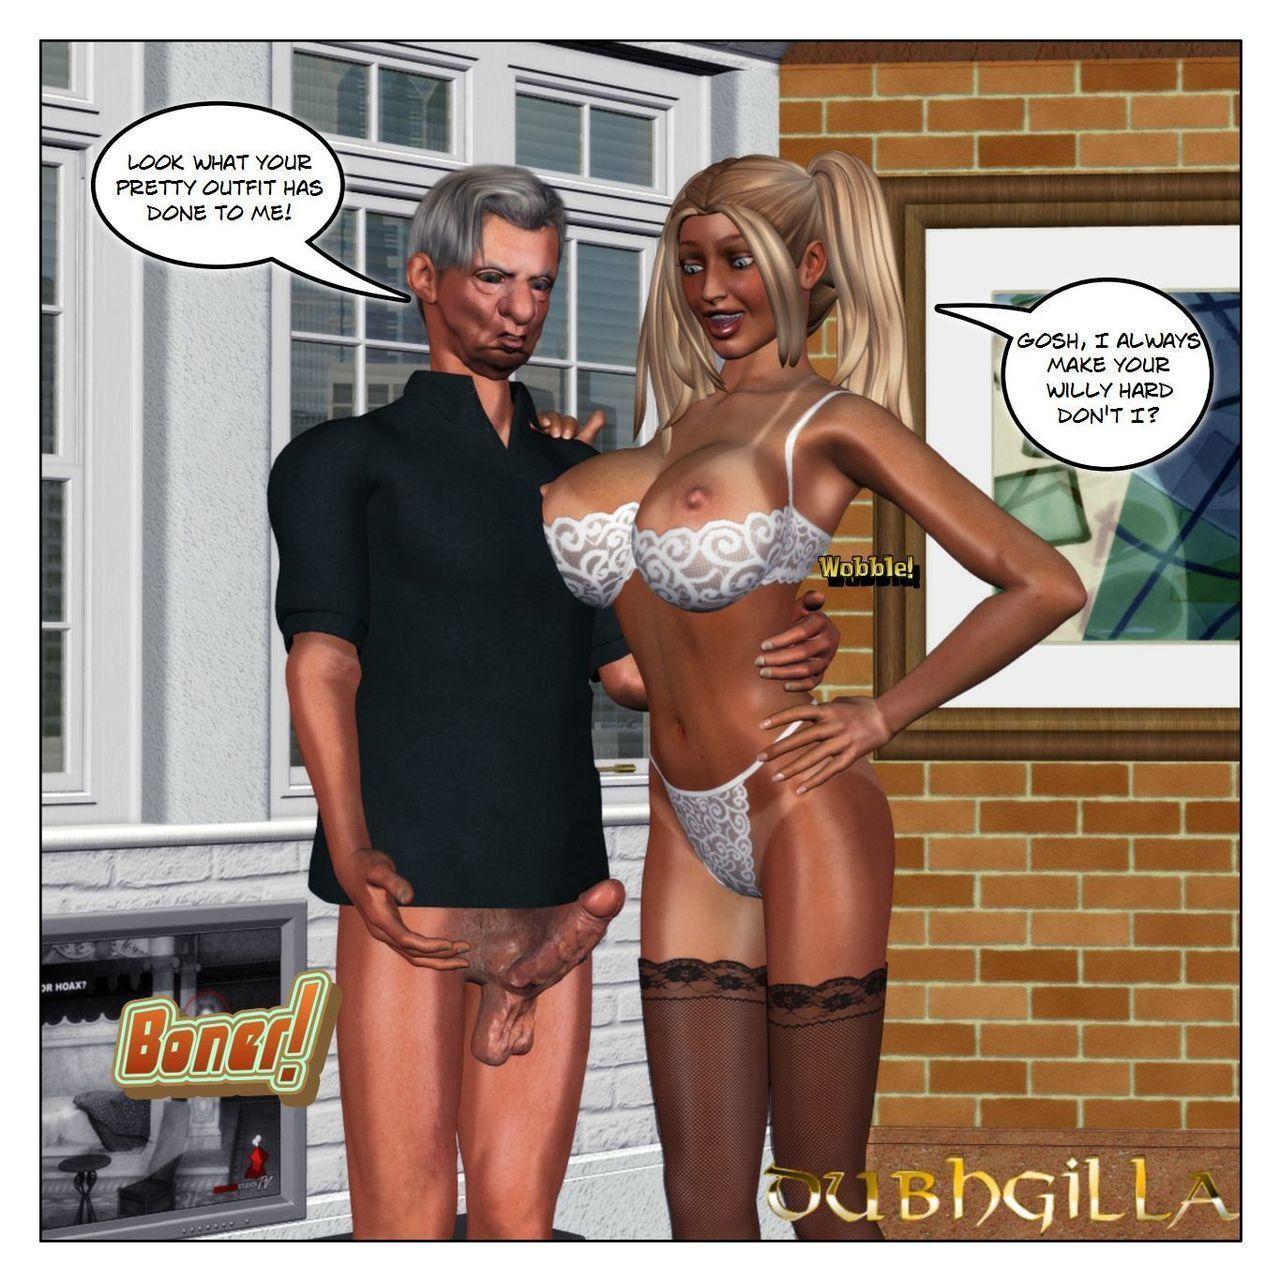 [Dubhgilla] Bert - The Ugly Old Fart